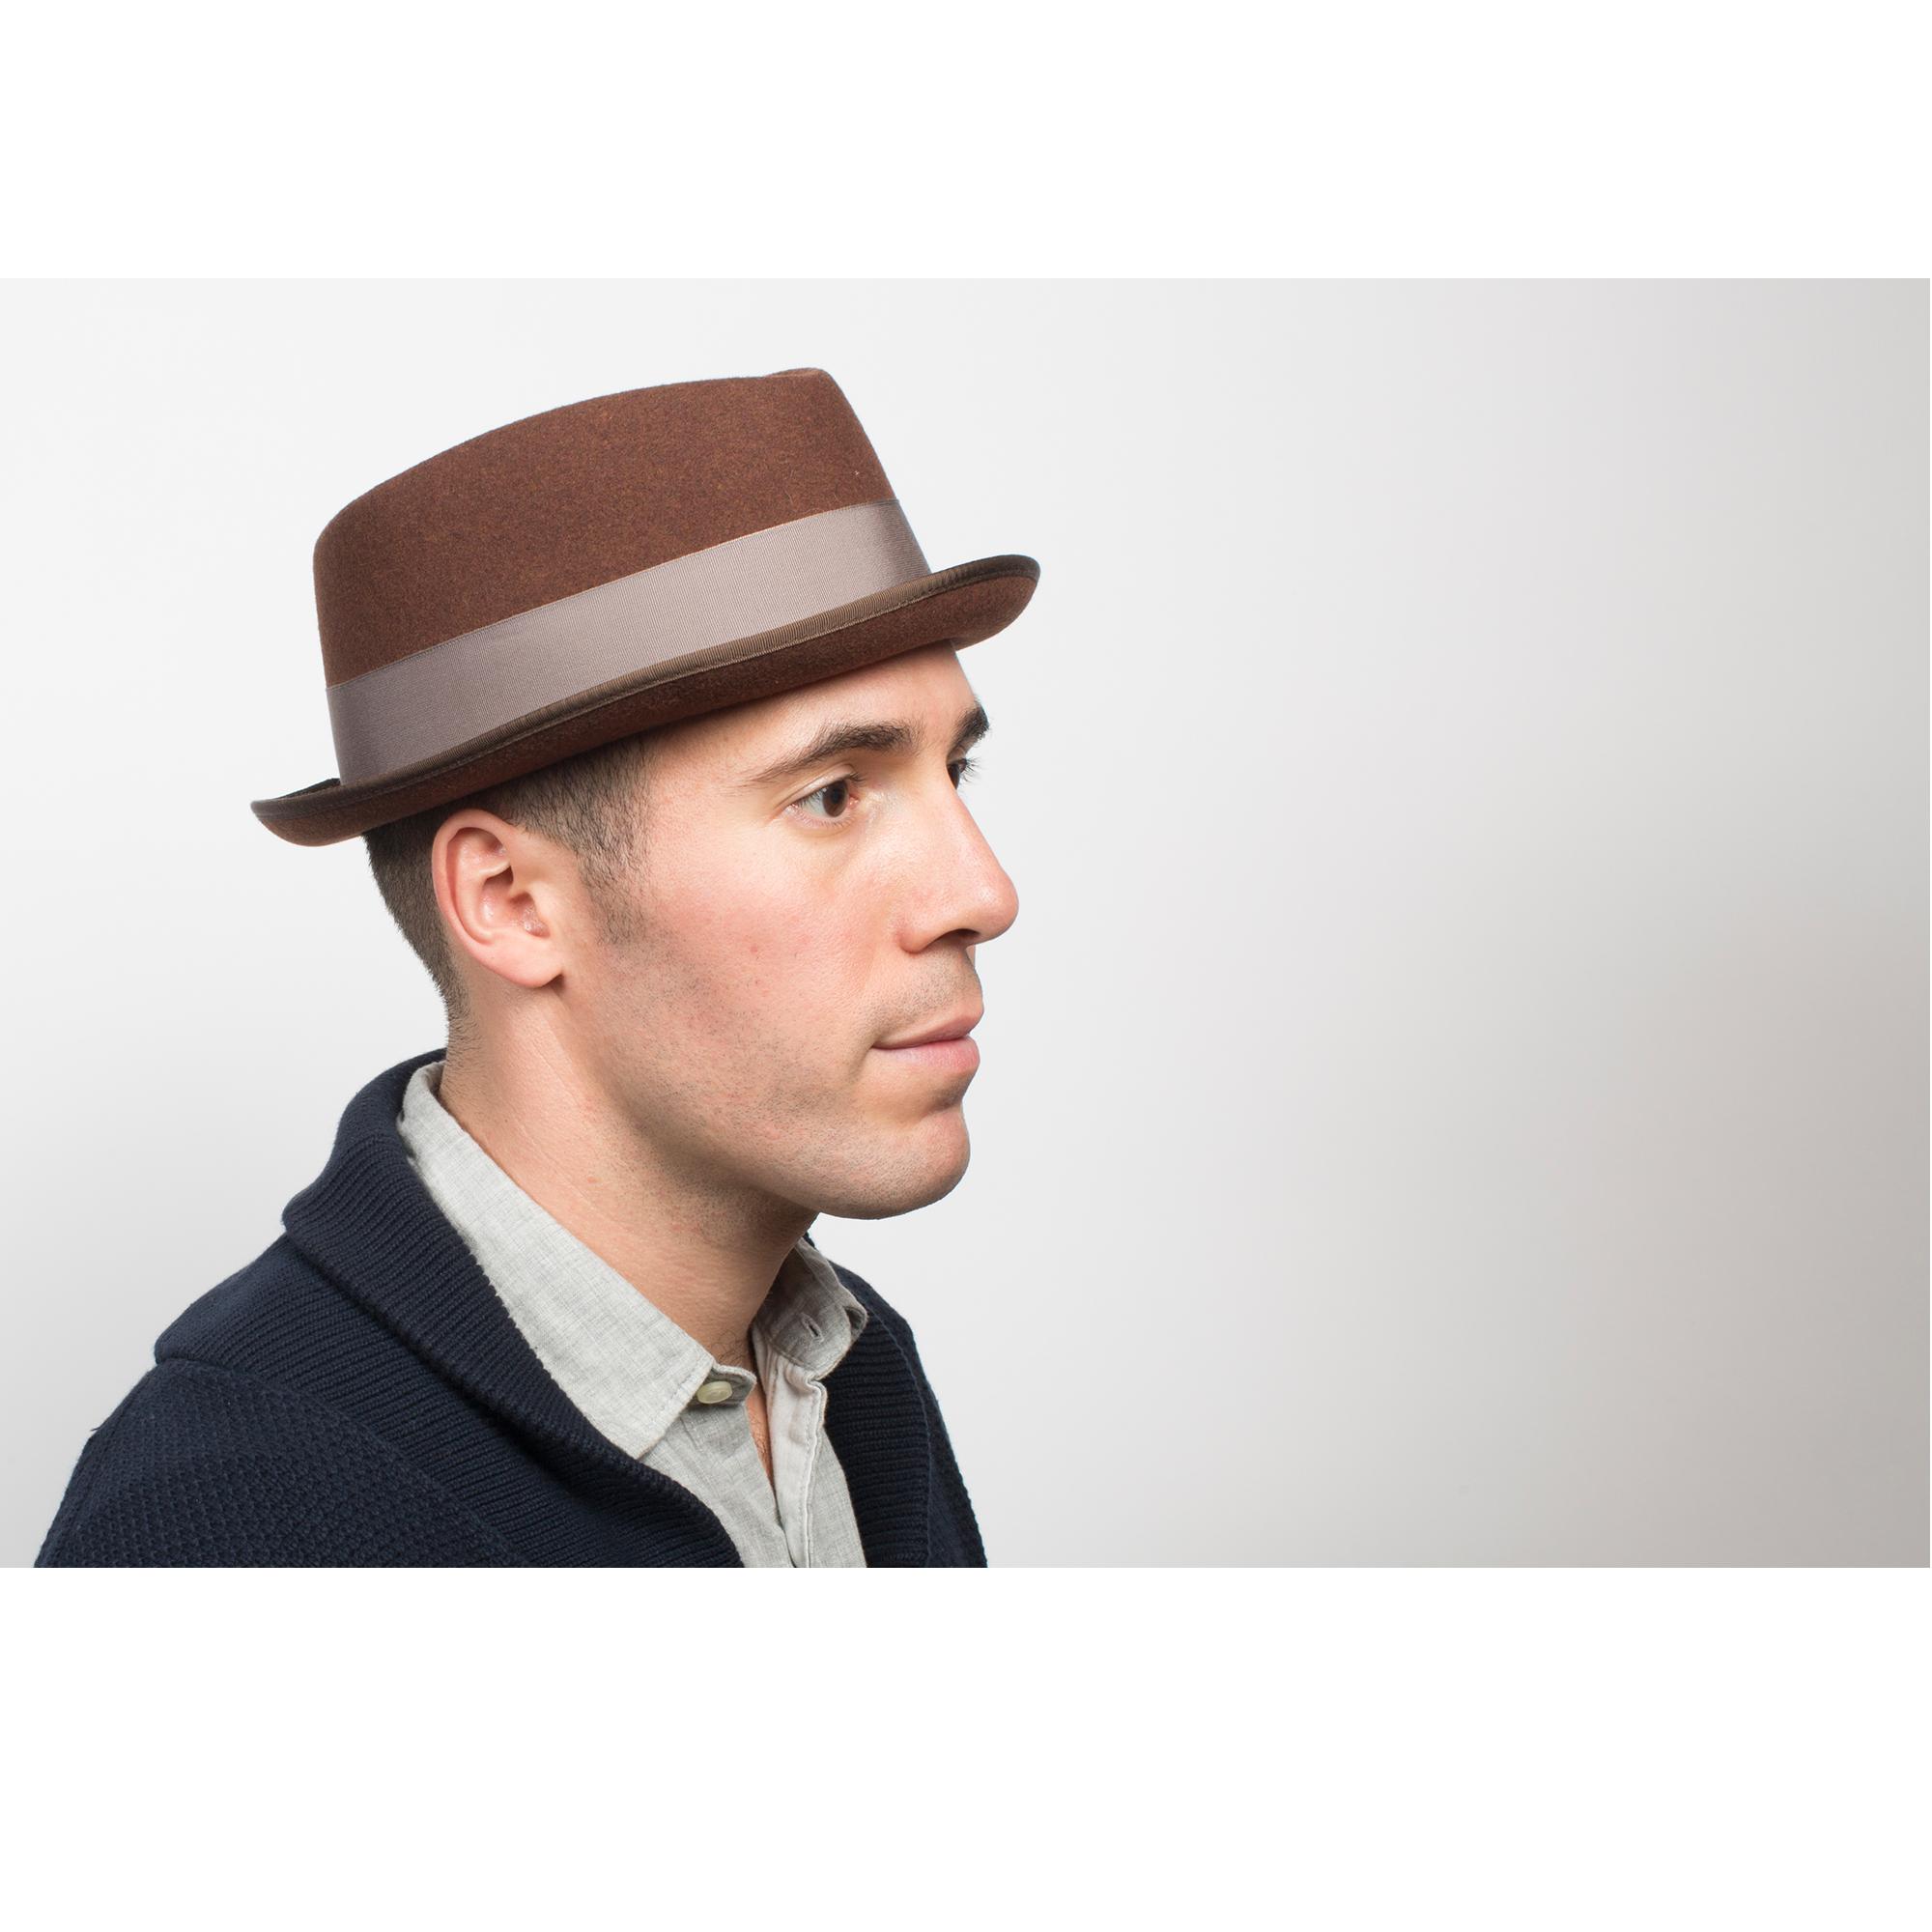 Goorin Slick Carter Fedora Hat In Mustard Size Large Goorin Carters Fedora Hat